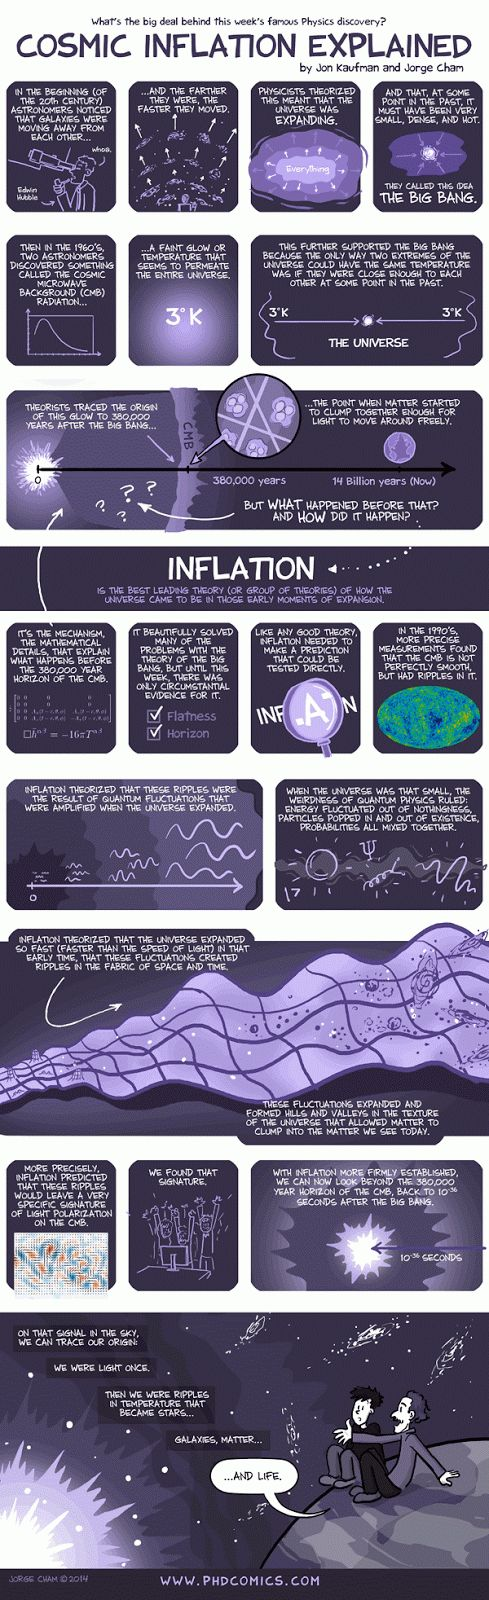 Spoiler Alert! Excellent Interstellar Timeline